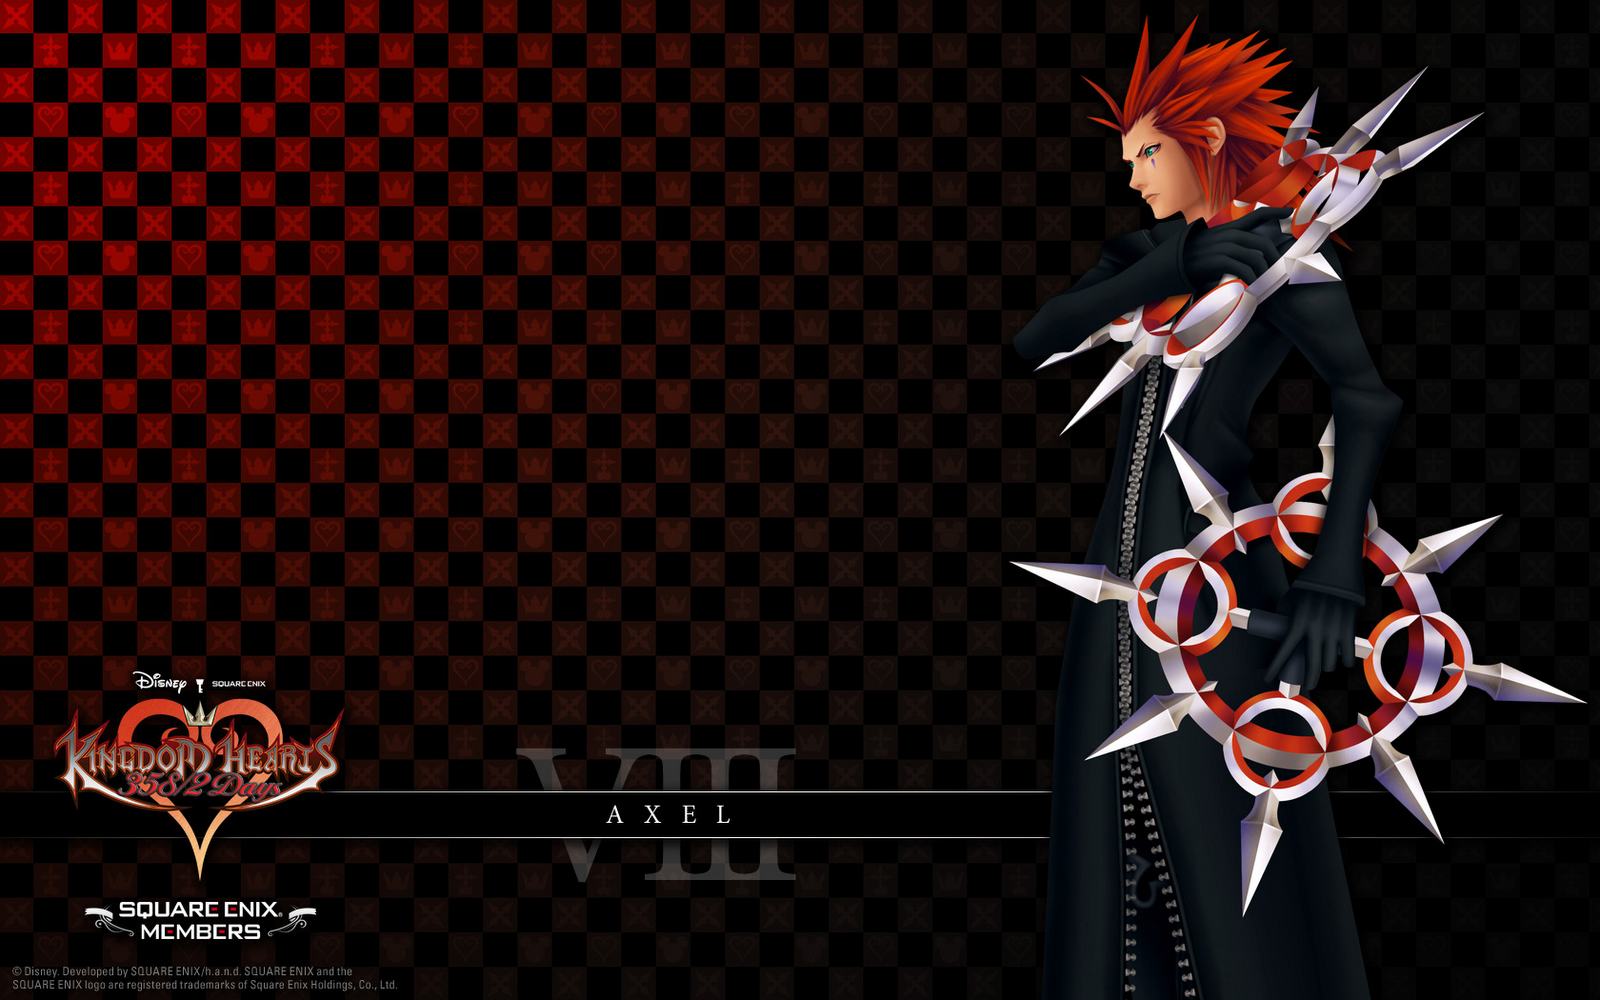 Organization XIII wallpapers Kingdom Hearts Organization 13 Wallpaper